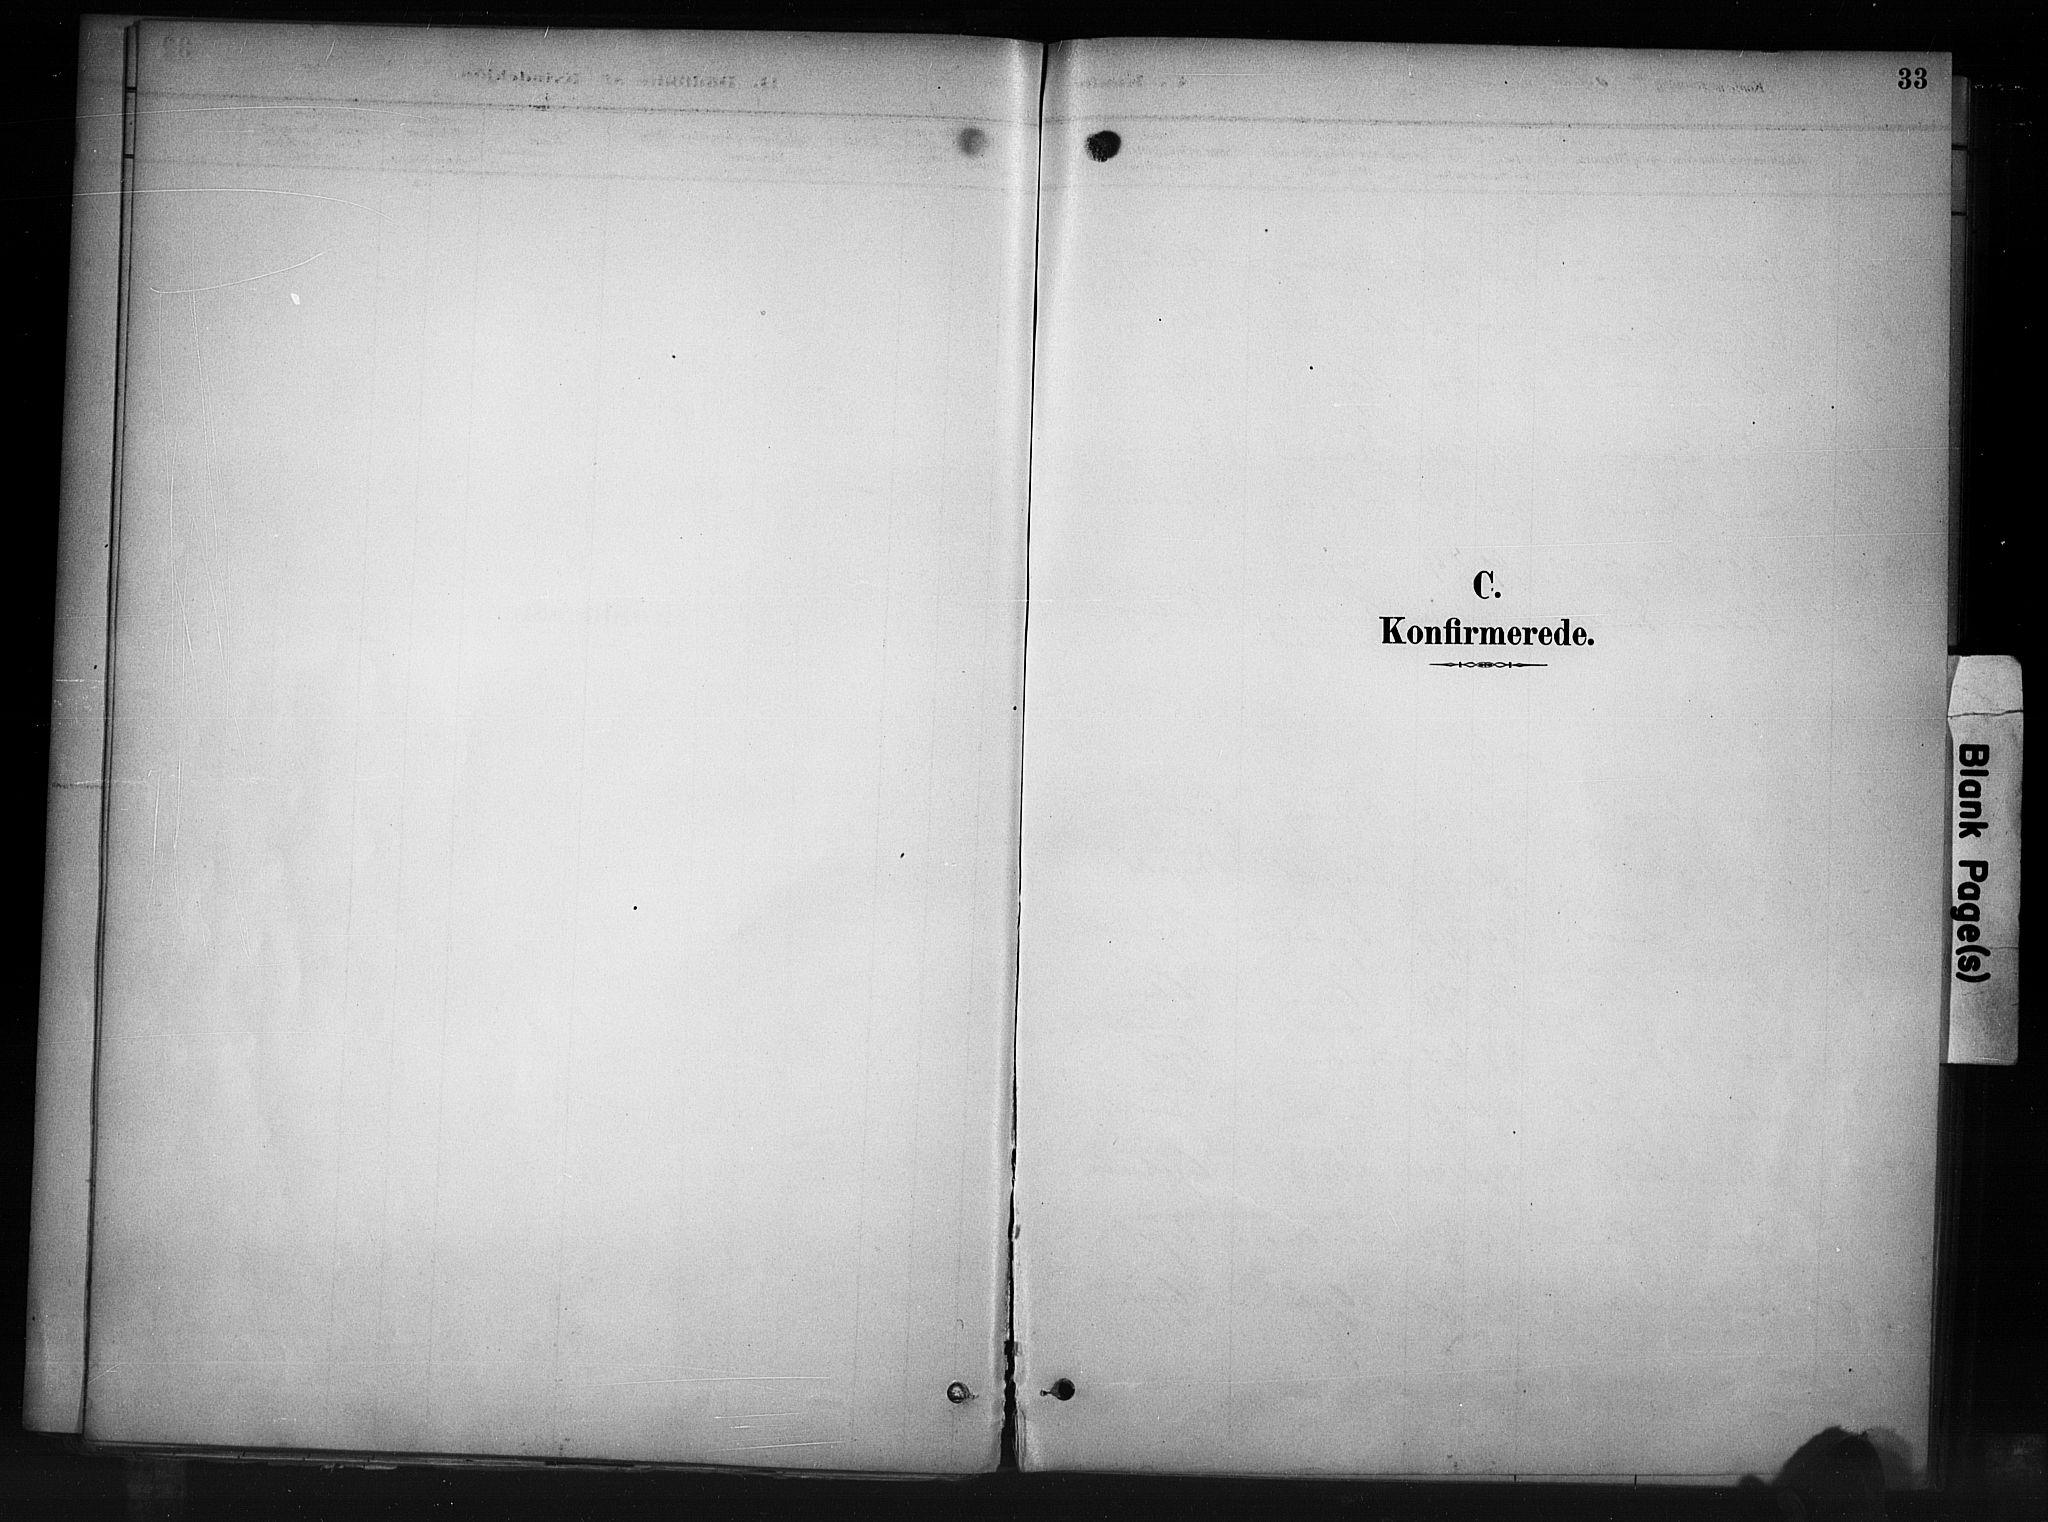 SAH, Nord-Aurdal prestekontor, Ministerialbok nr. 11, 1883-1896, s. 33